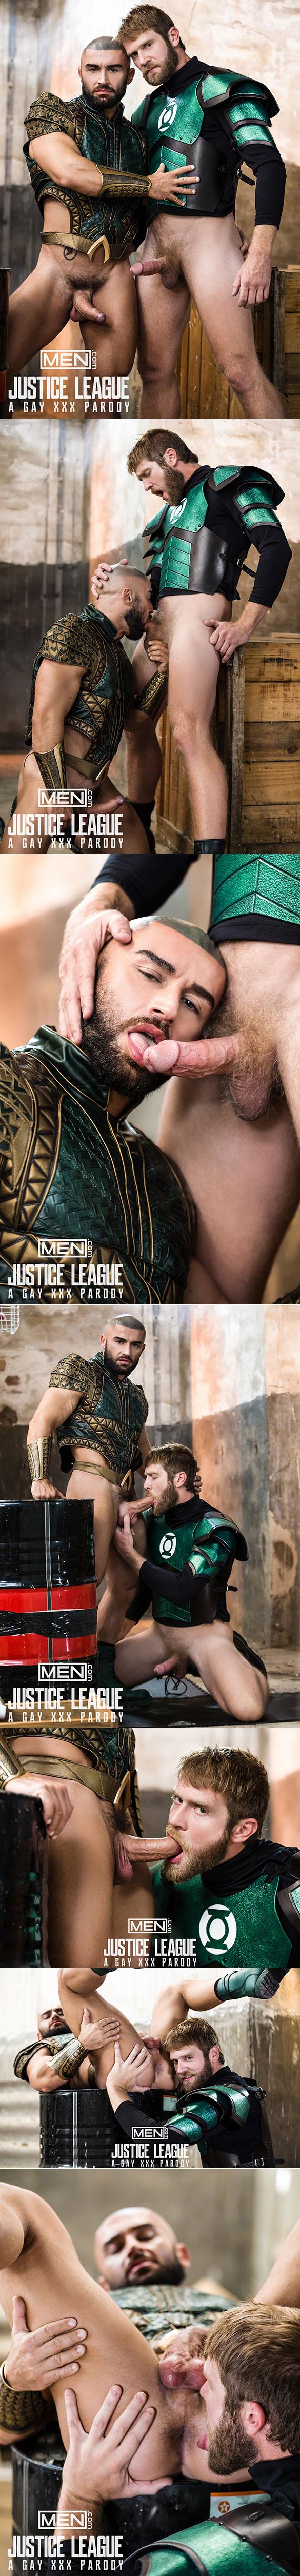 "Men.com: Colby Keller bangs Francois Sagat in ""Justice League: A Gay XXX Parody, Part 2"""